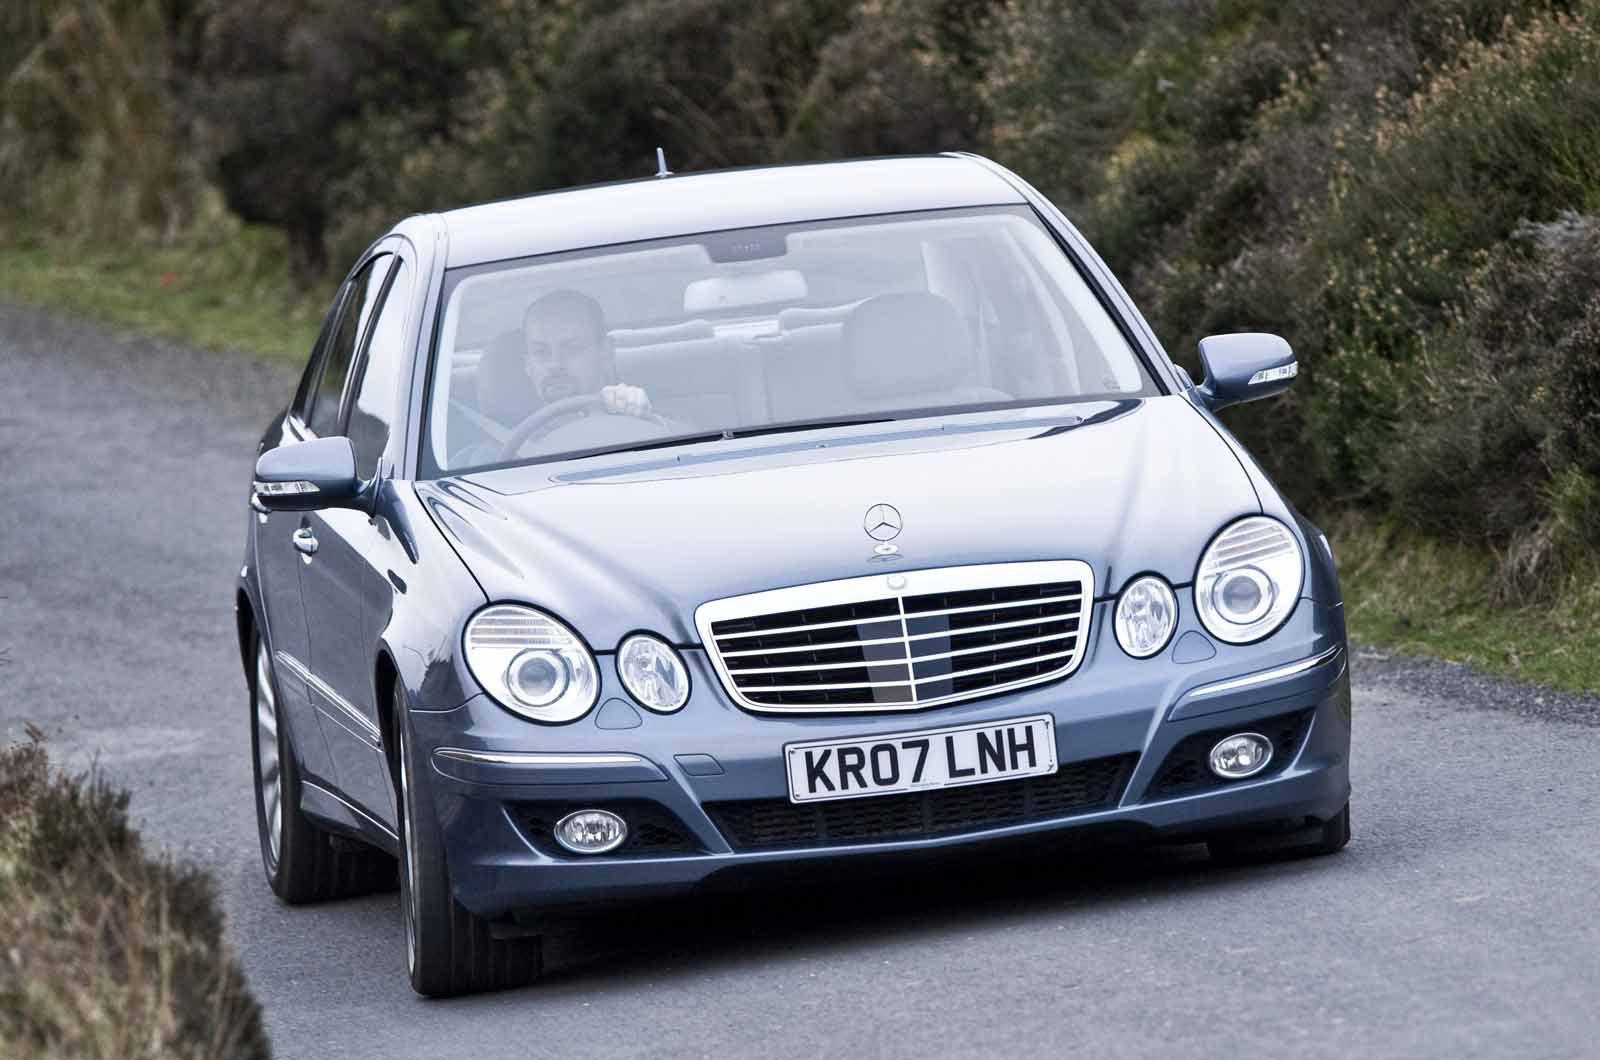 Mercedes E280 CDI 2008 front